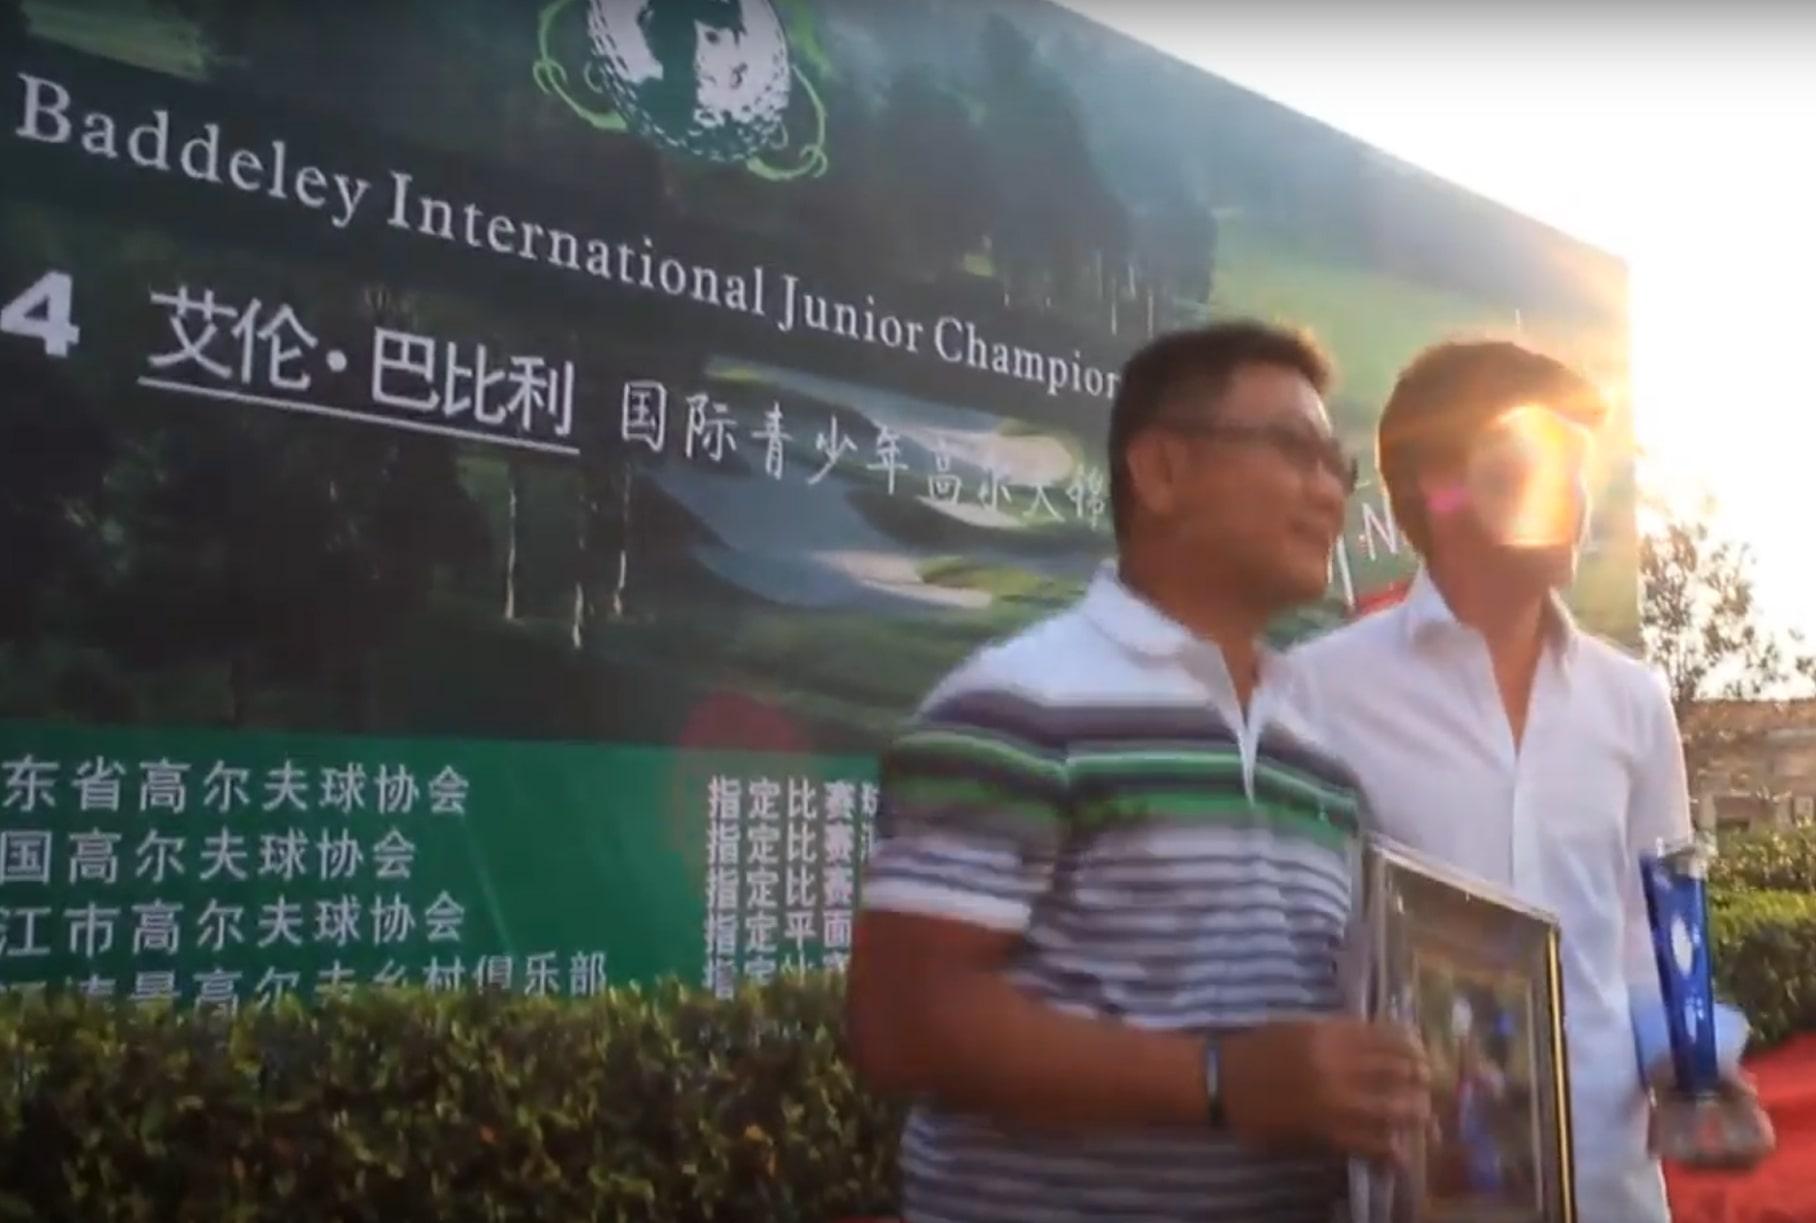 ABIJC 2014 China Championship